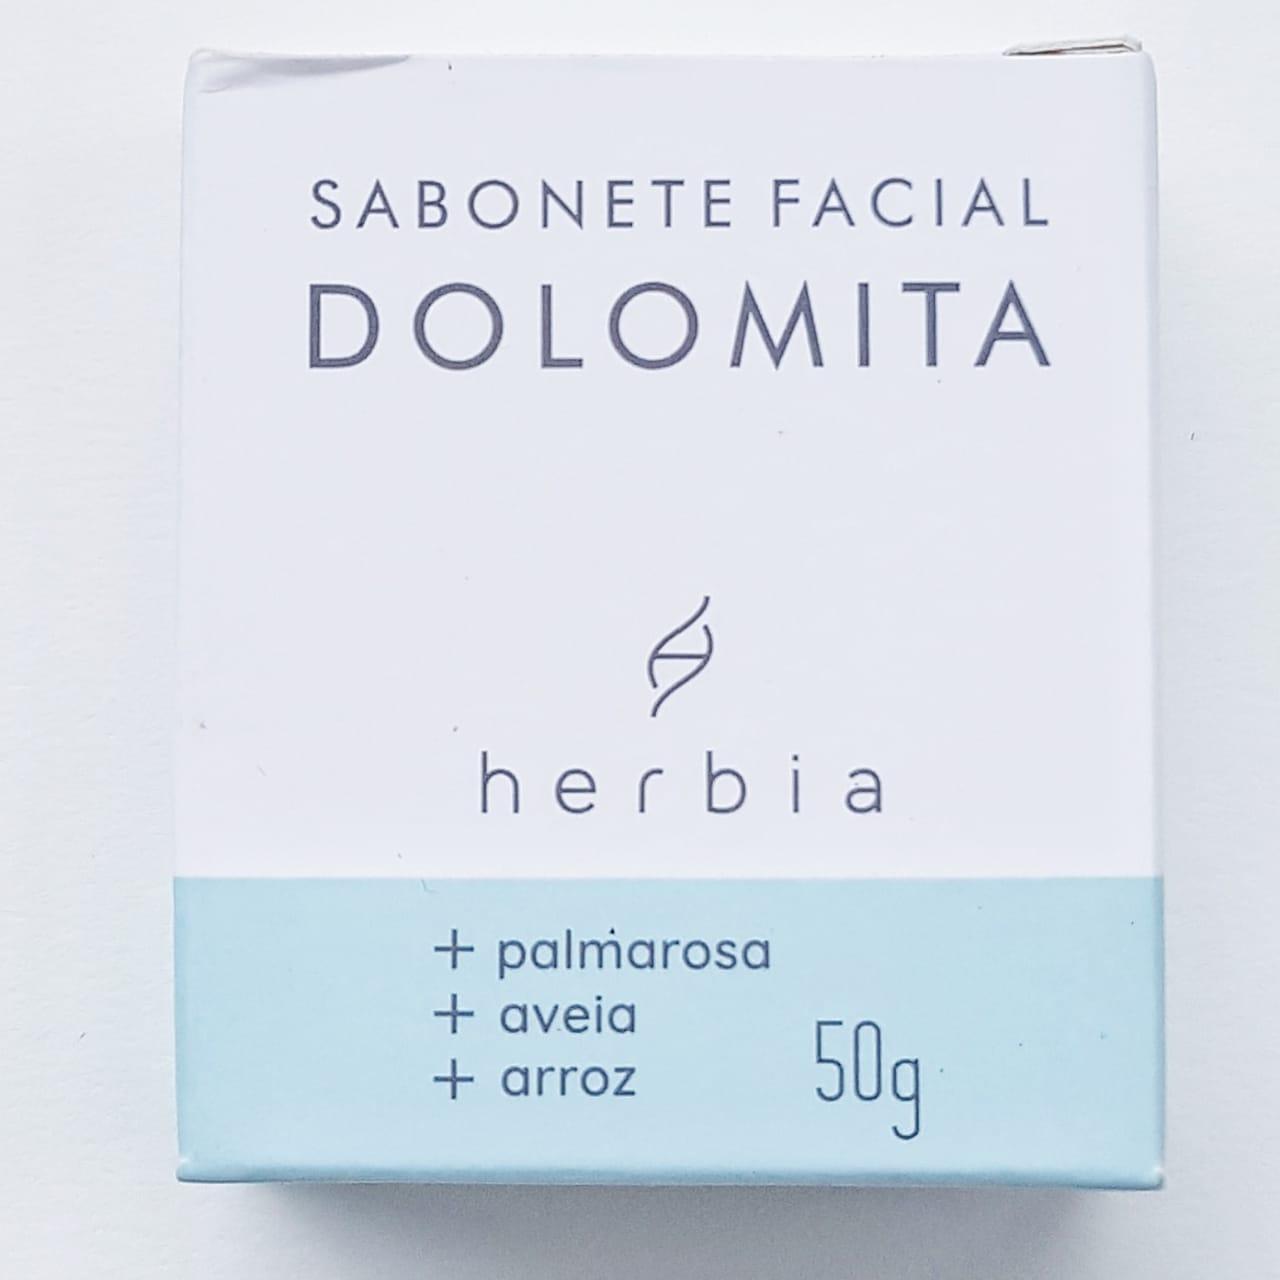 Sabonete Facial Natural - Dolomita - Herbia